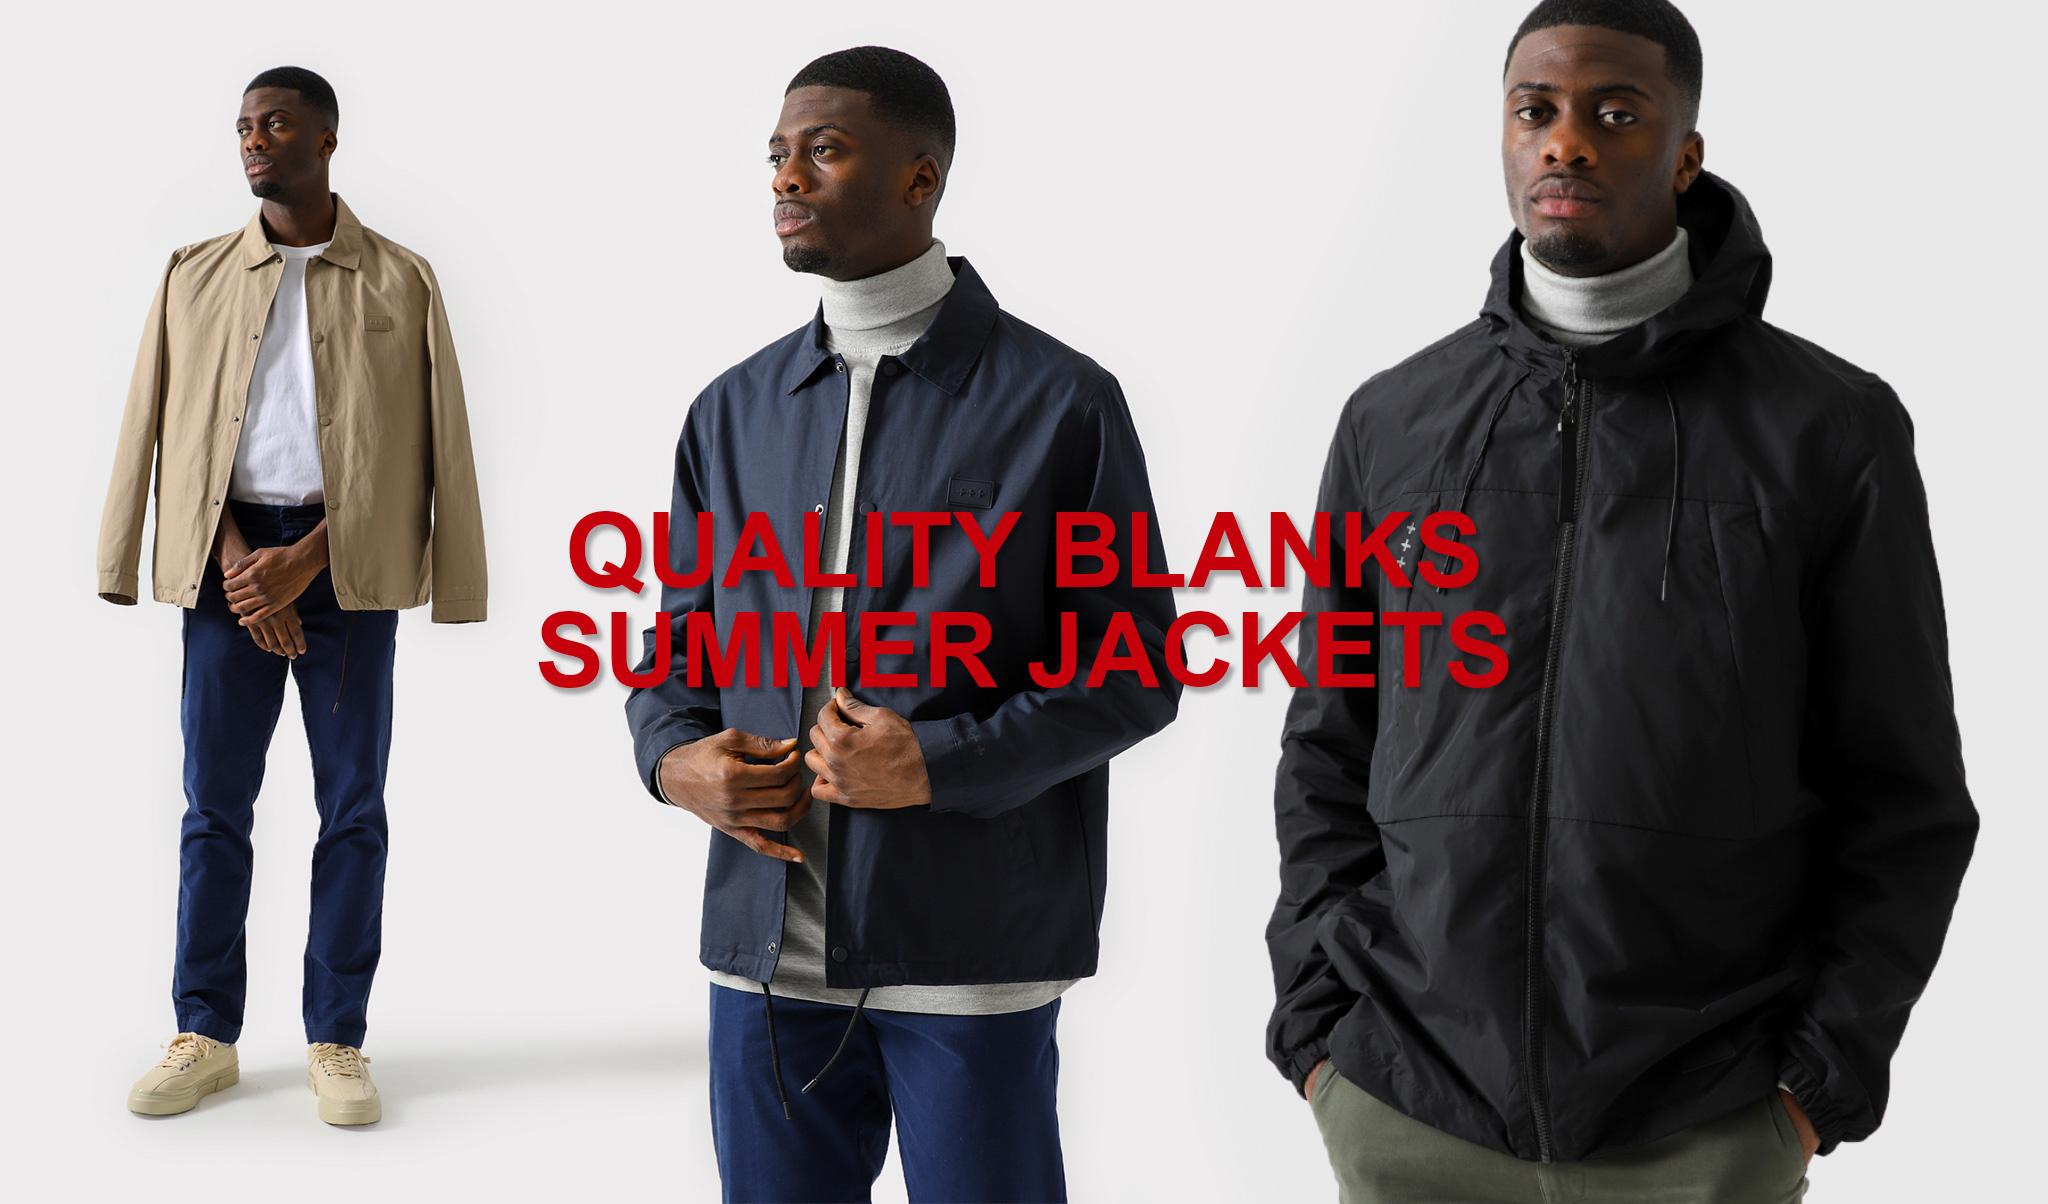 New Quality Blanks Jackets